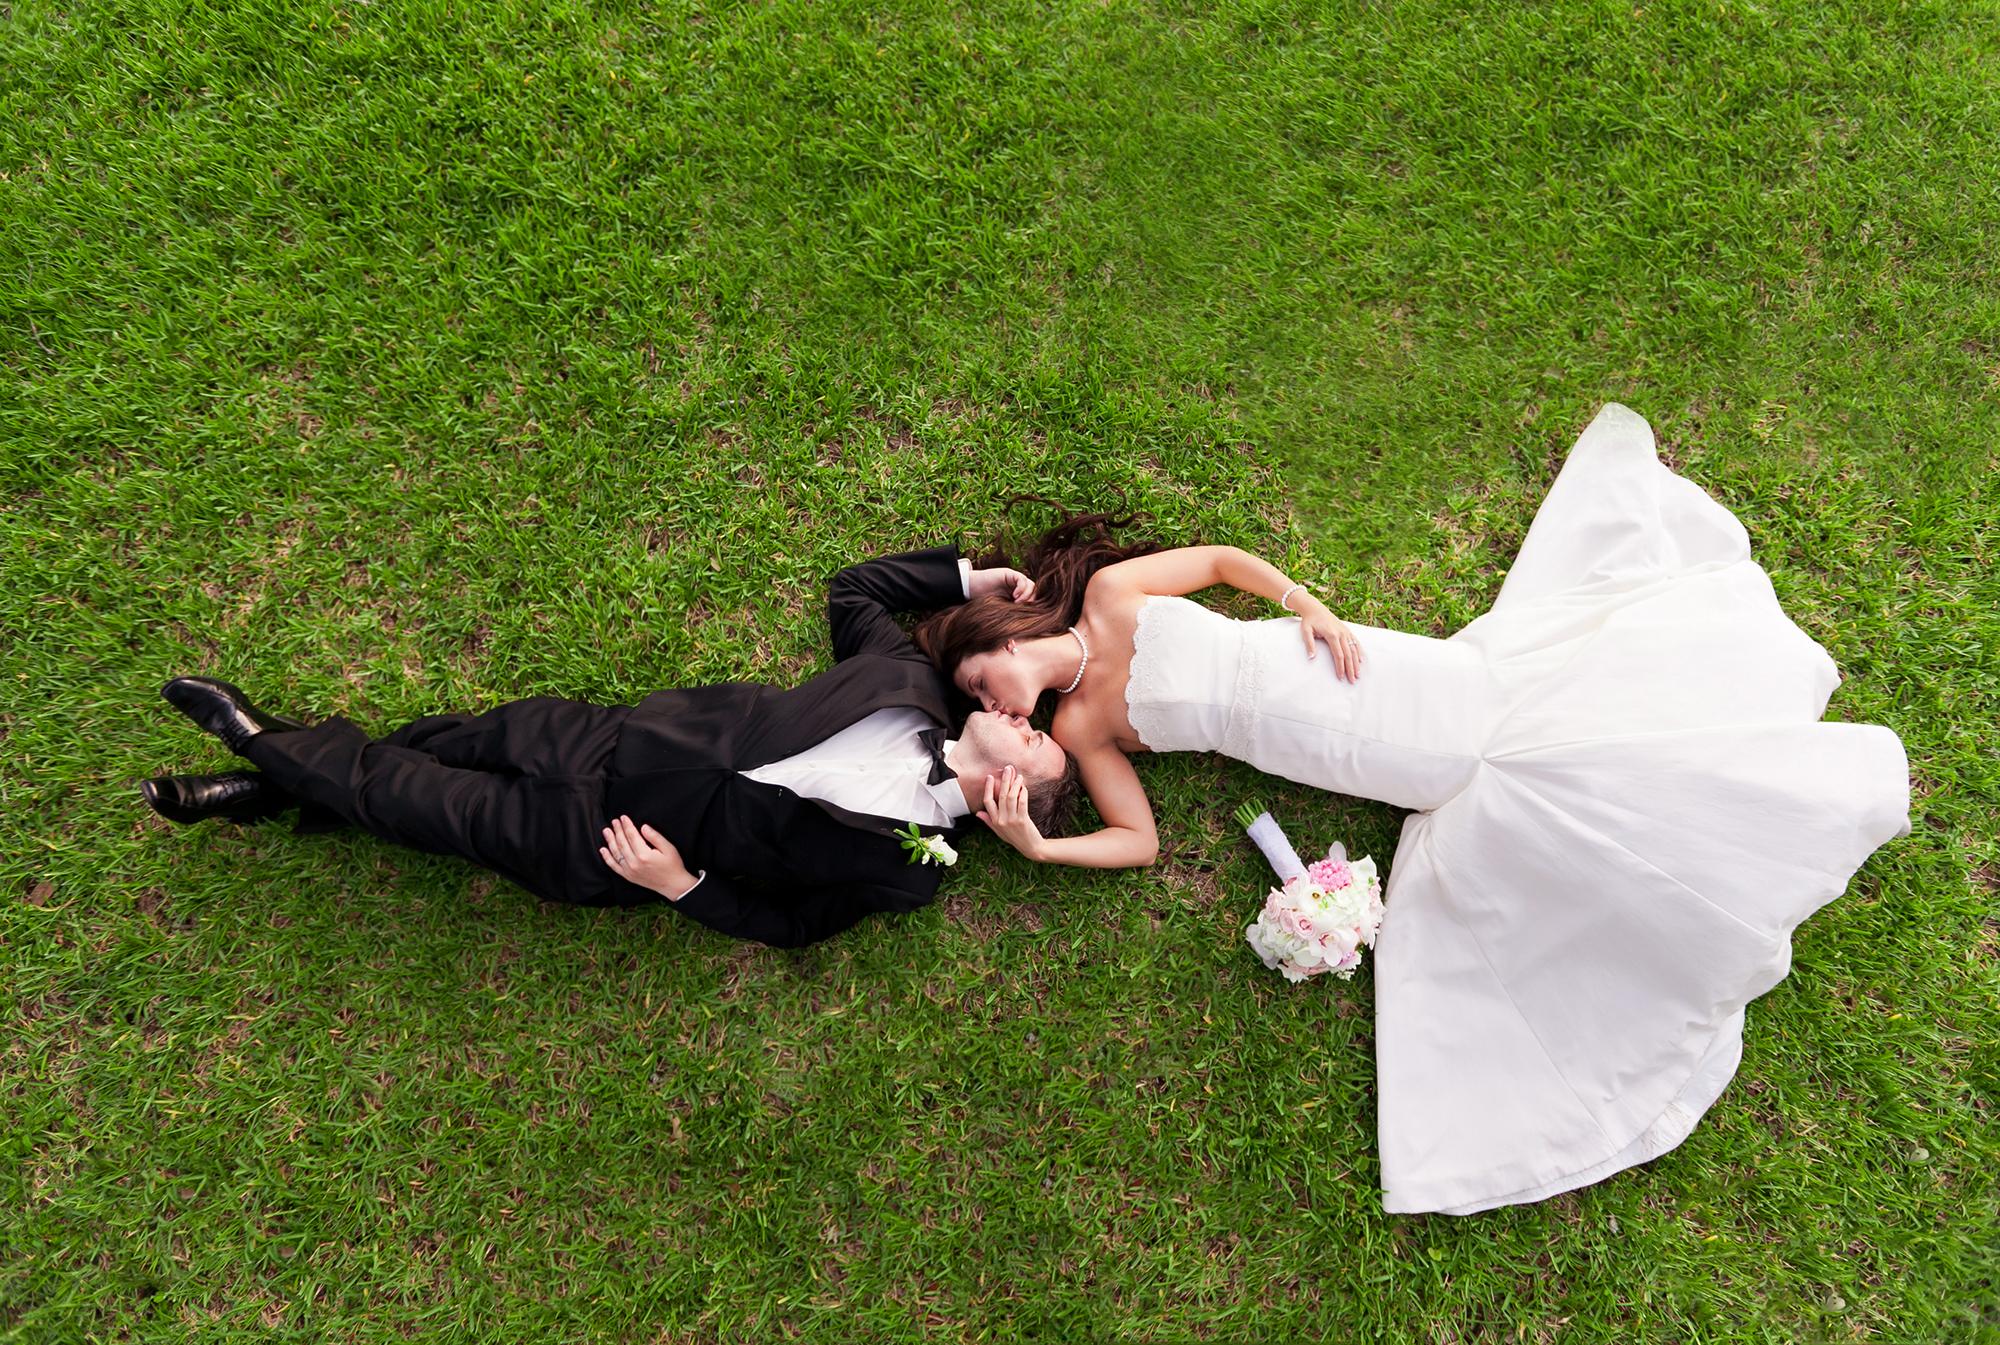 adam-szarmack-bride-groom-kiss-above.jpg